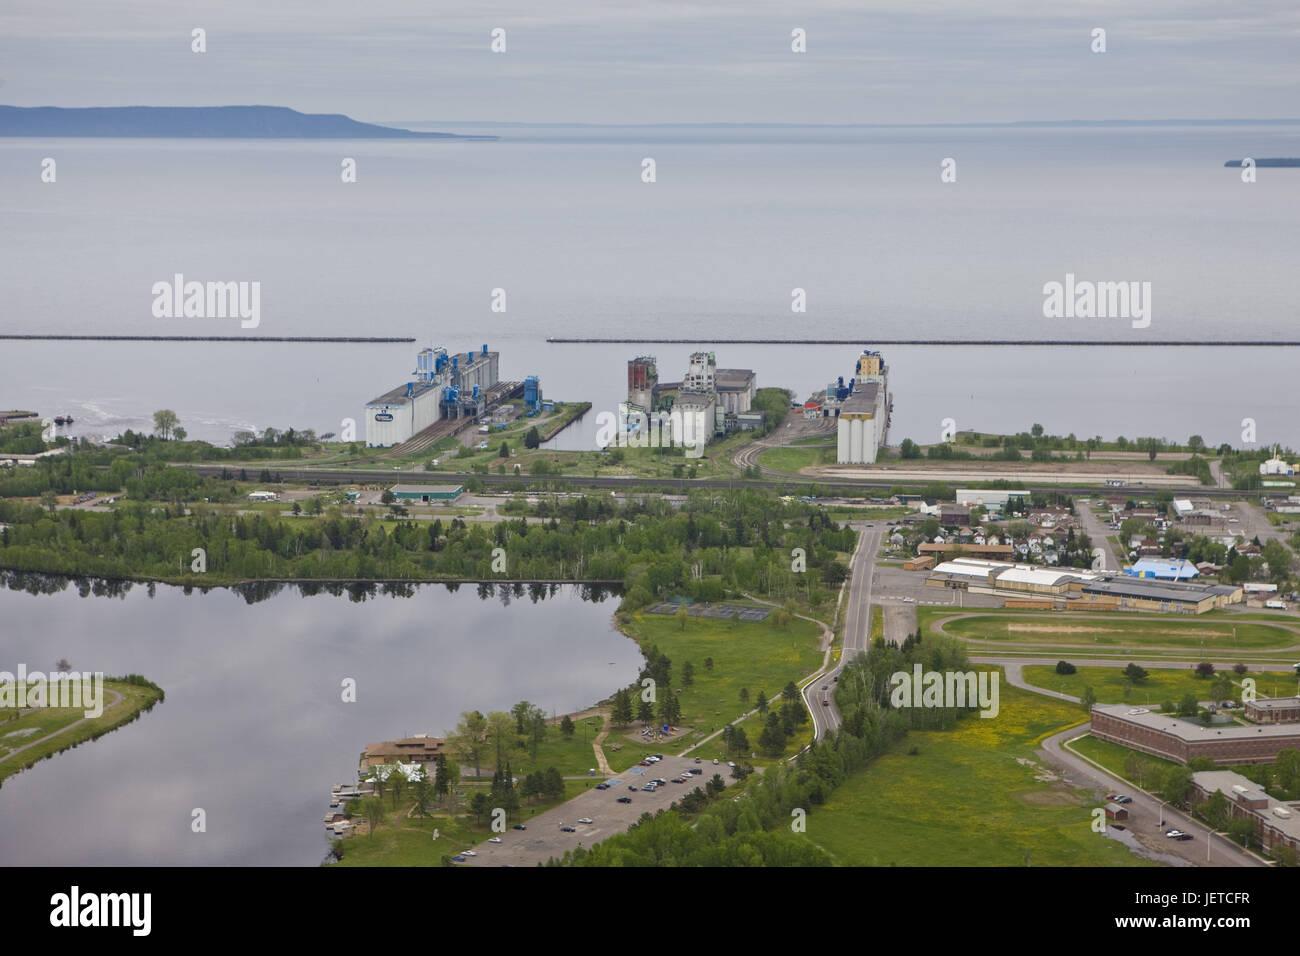 Canada, Ontario, brine Superior, Thunder Bay, warehouses, granaries, ship terminals, boulevard brine, view, - Stock Image